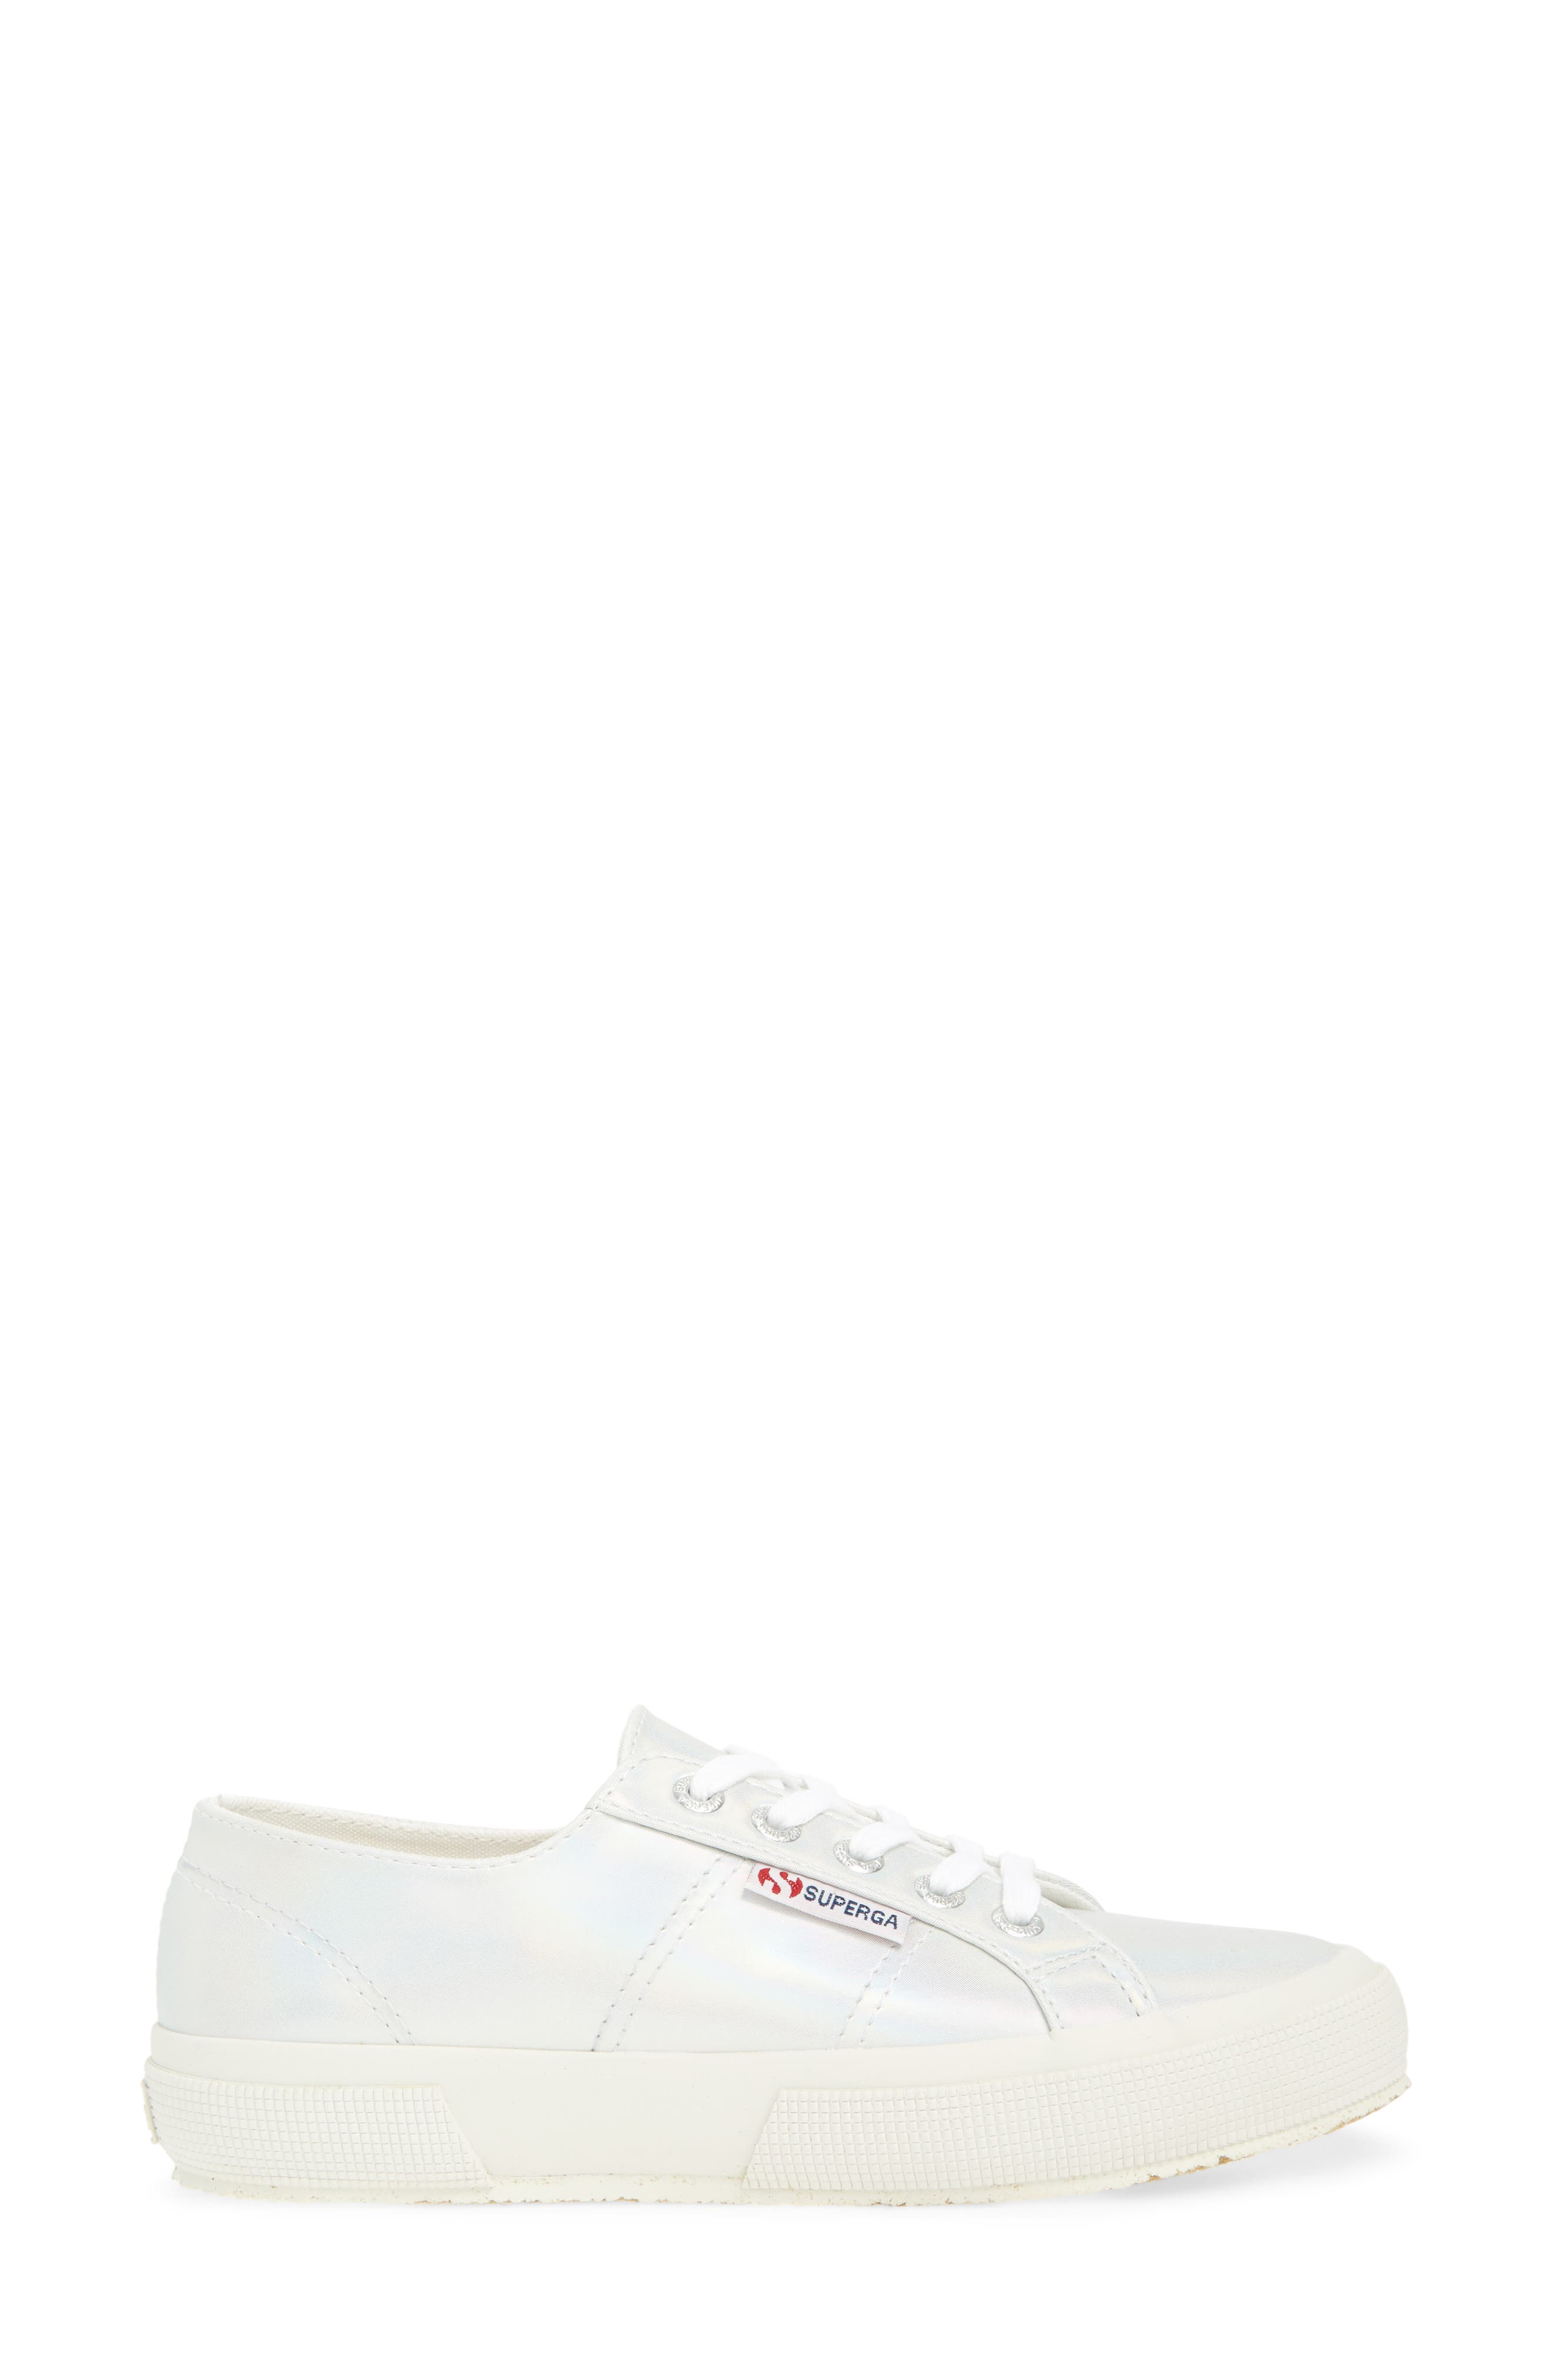 2750 Hologramw Low Top Sneaker,                             Alternate thumbnail 3, color,                             Iridescent